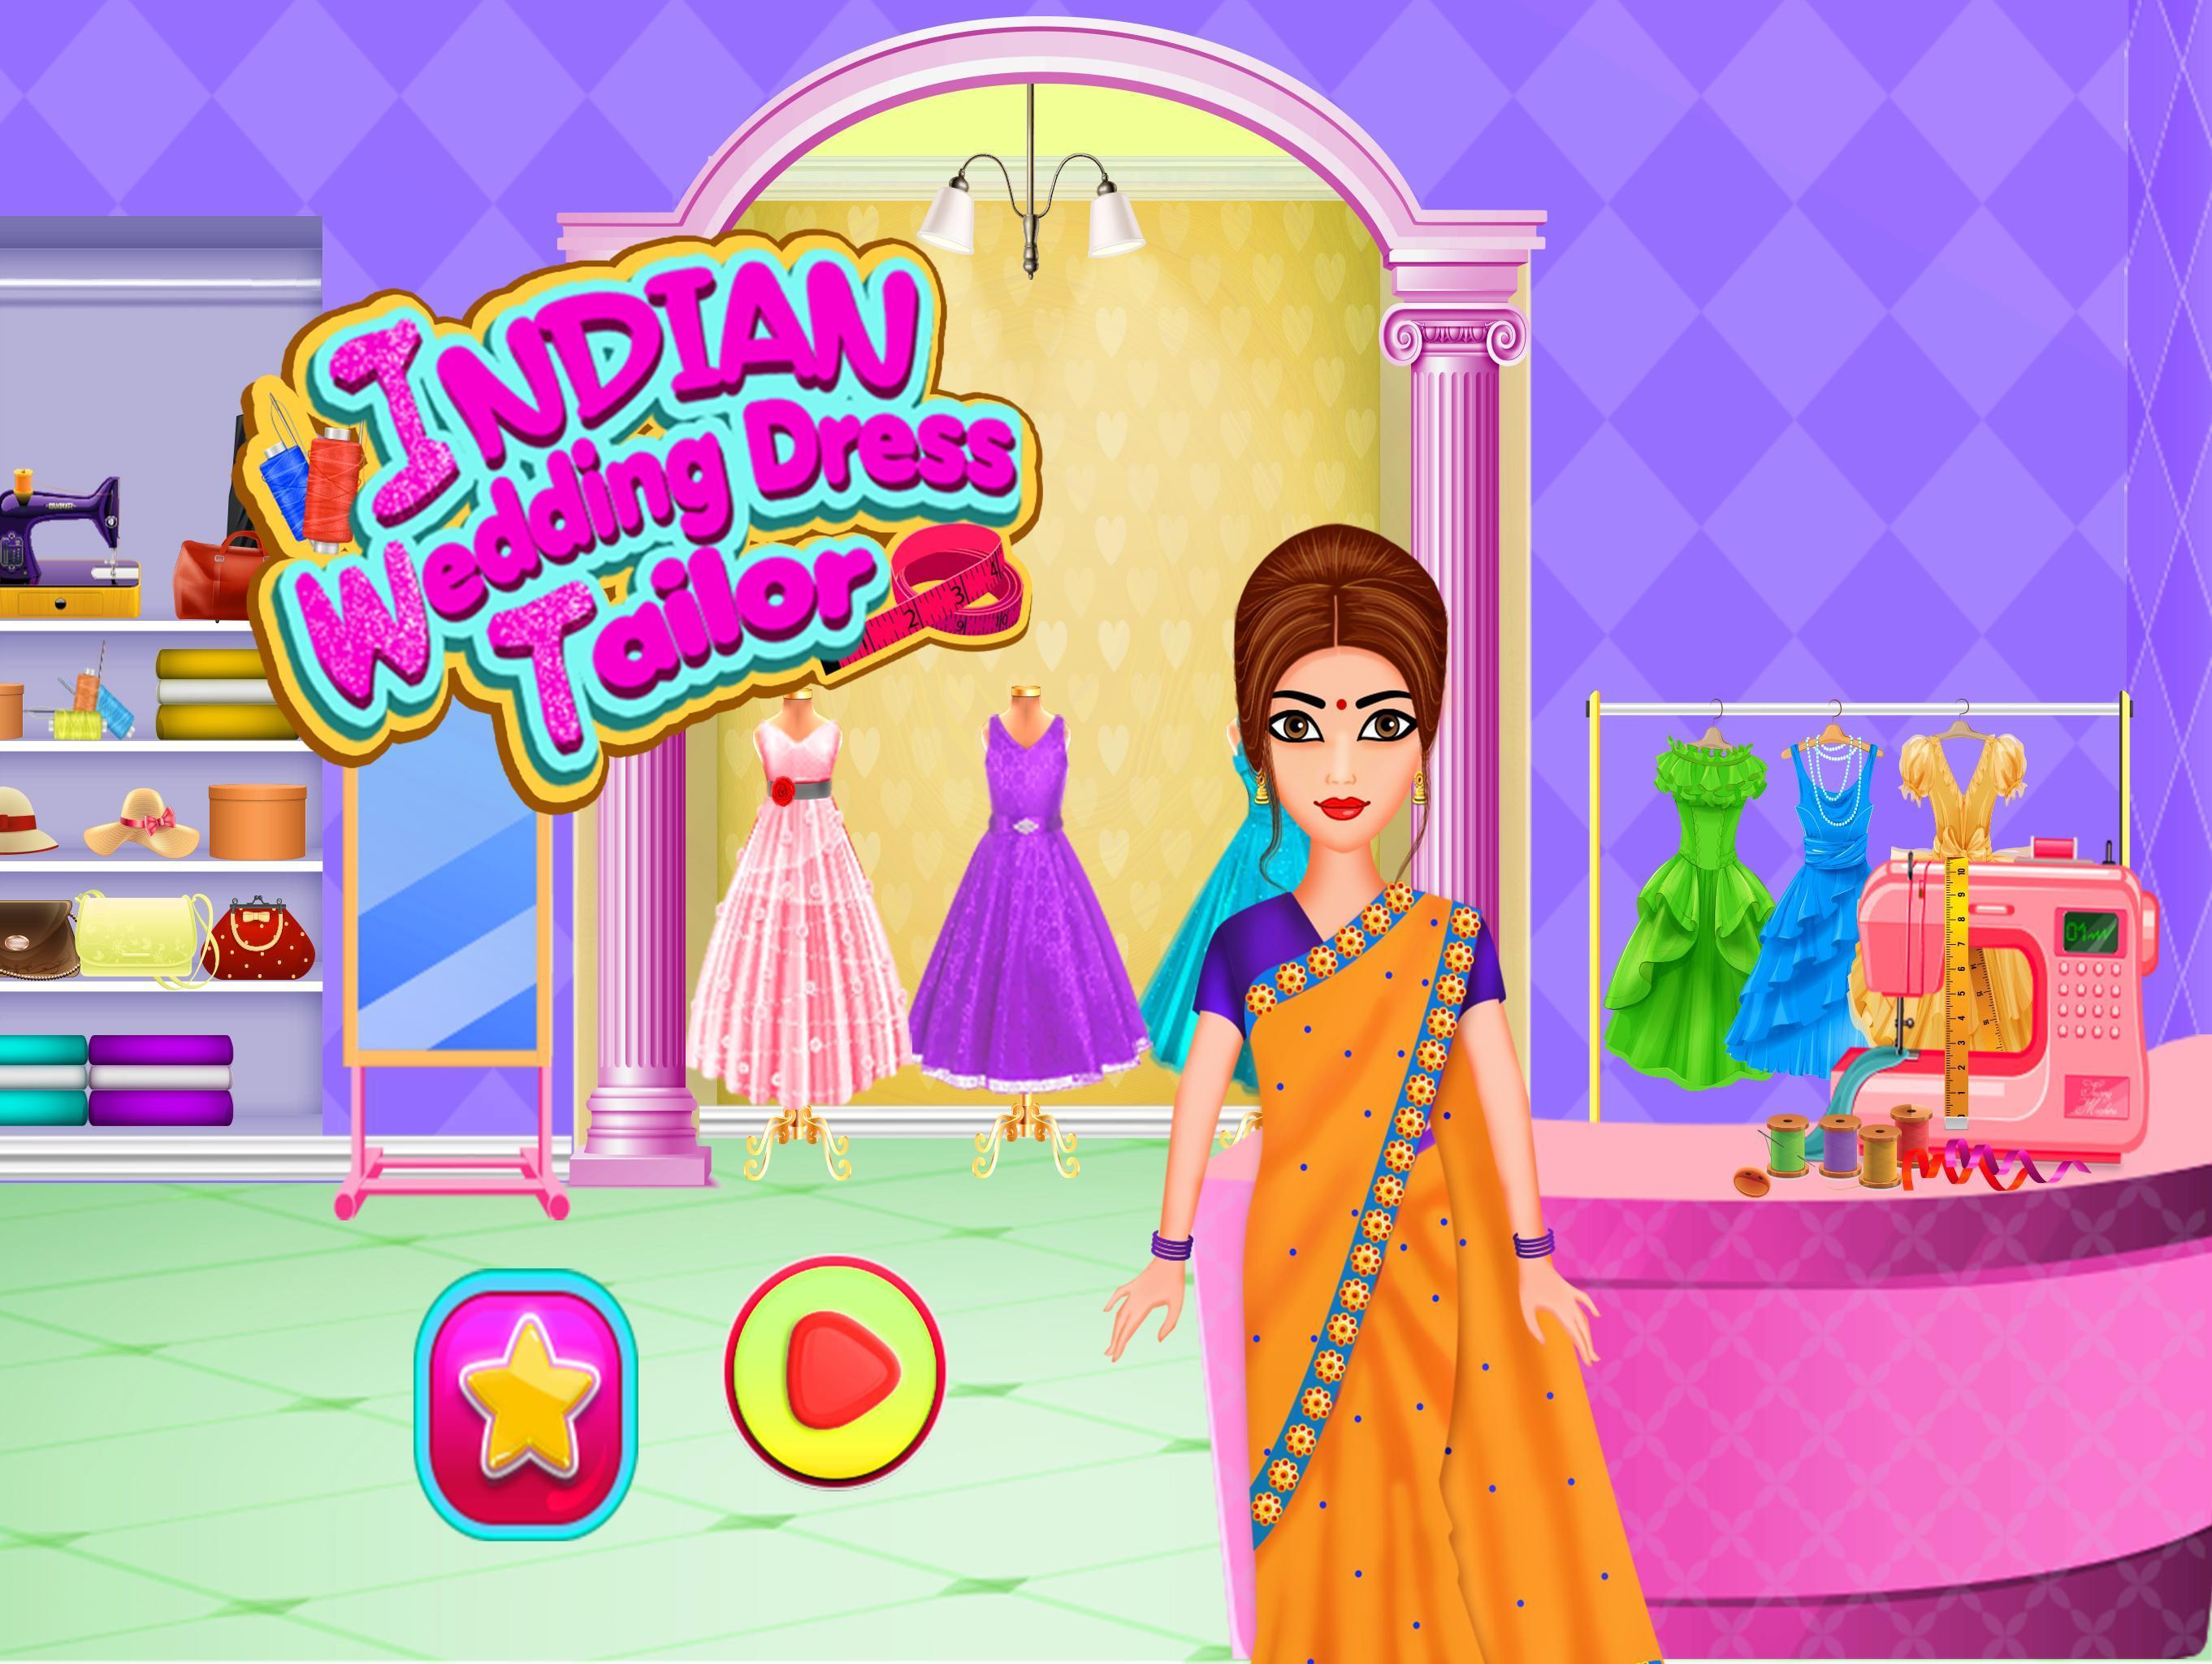 Indian Wedding Dress Tailor Little Style Boutique 1.0.4 Screenshot 13